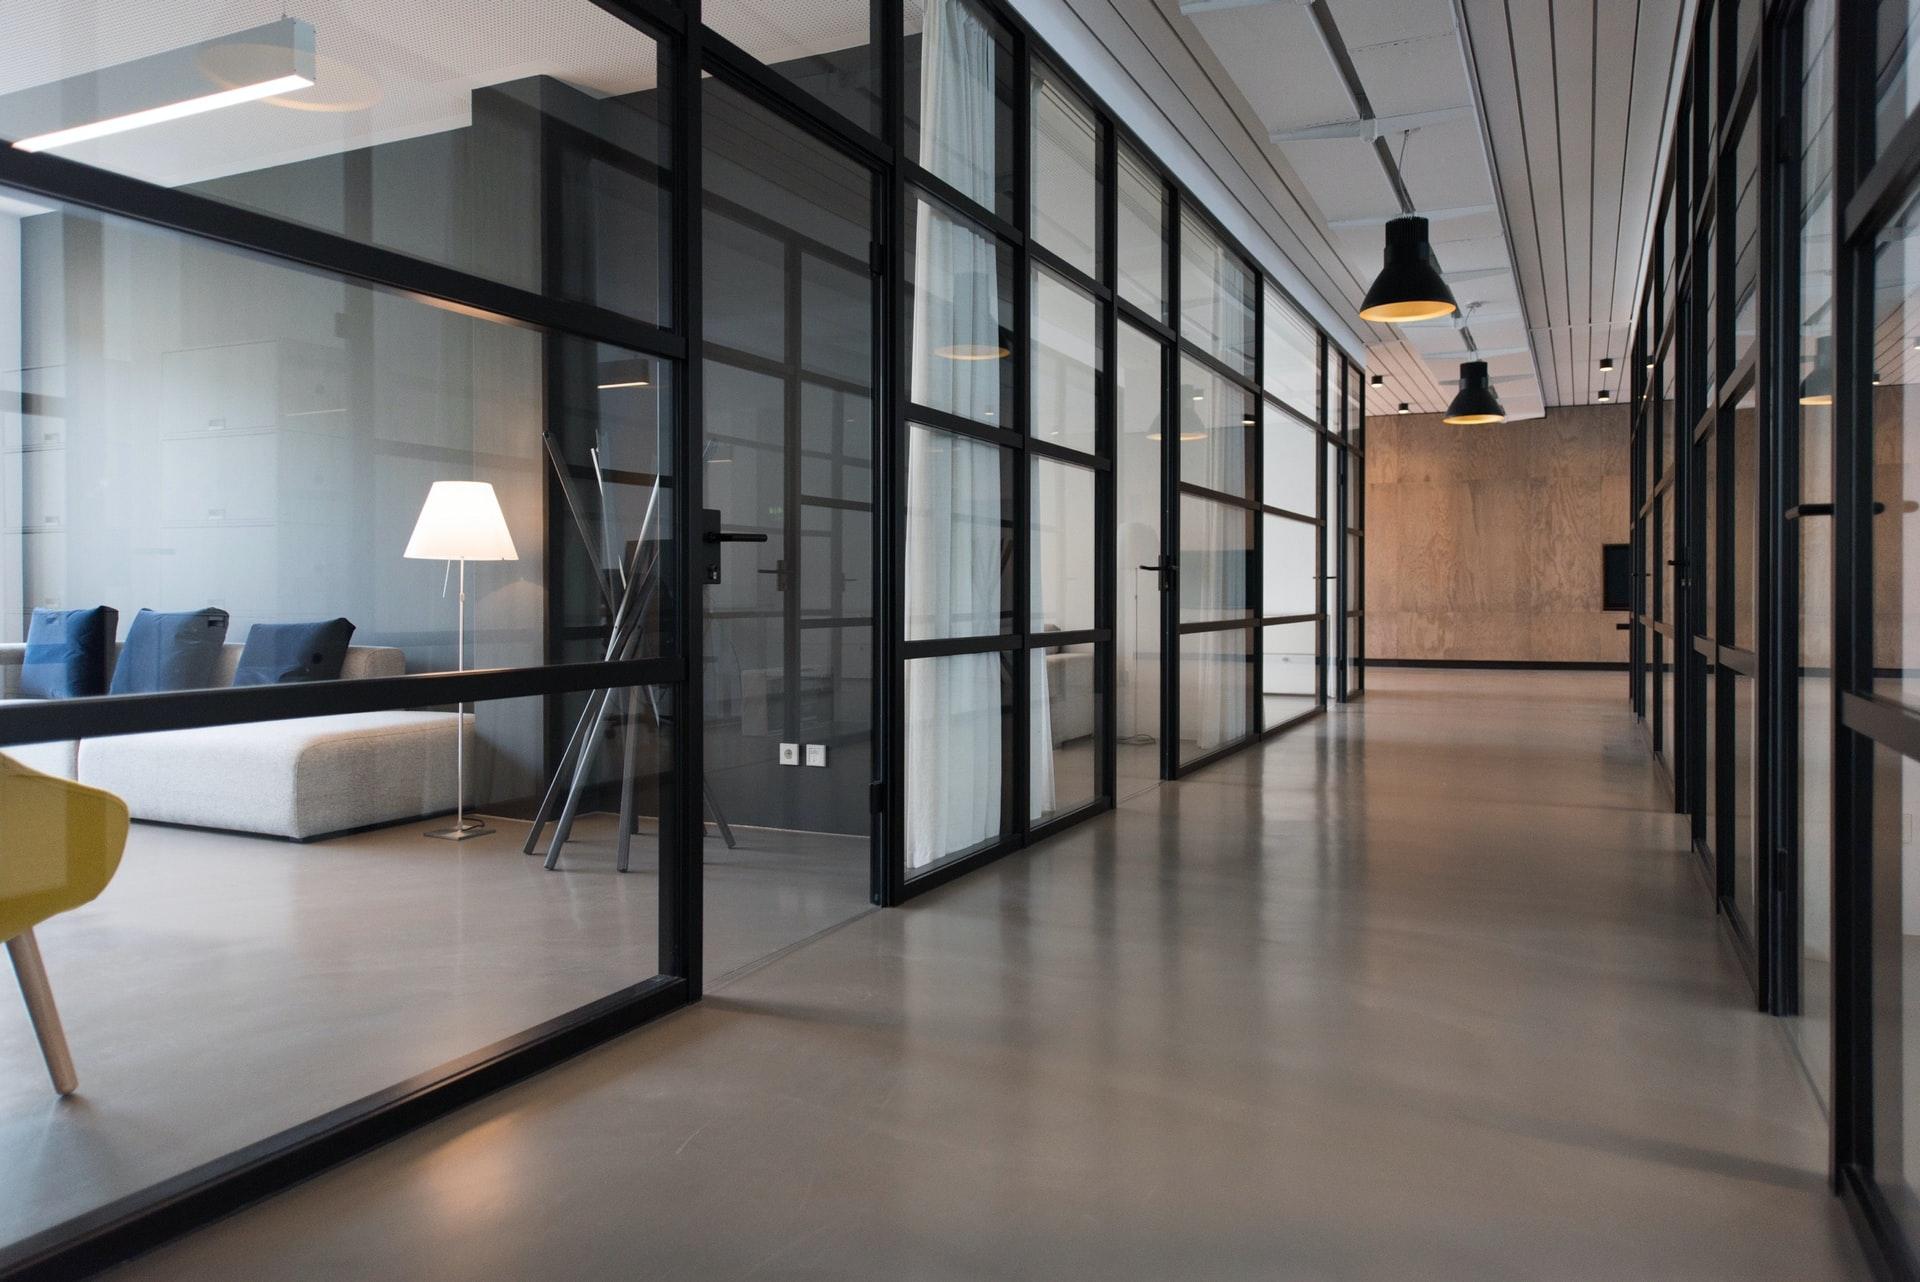 kompani pastrimi dhe dezifenktimi zyra dhe shtepi tirane